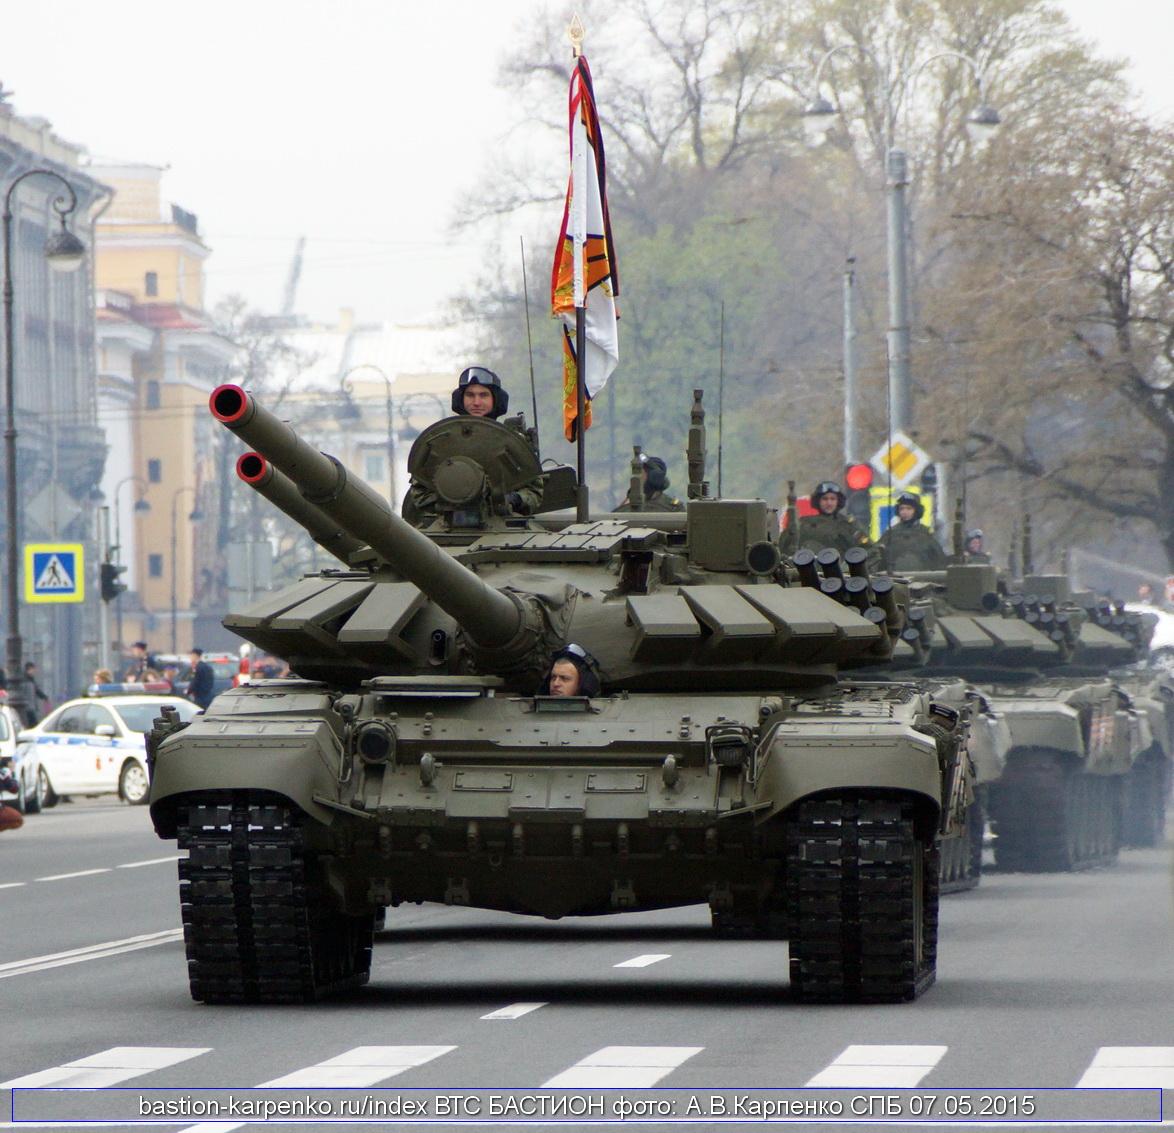 T-72B3 on parade